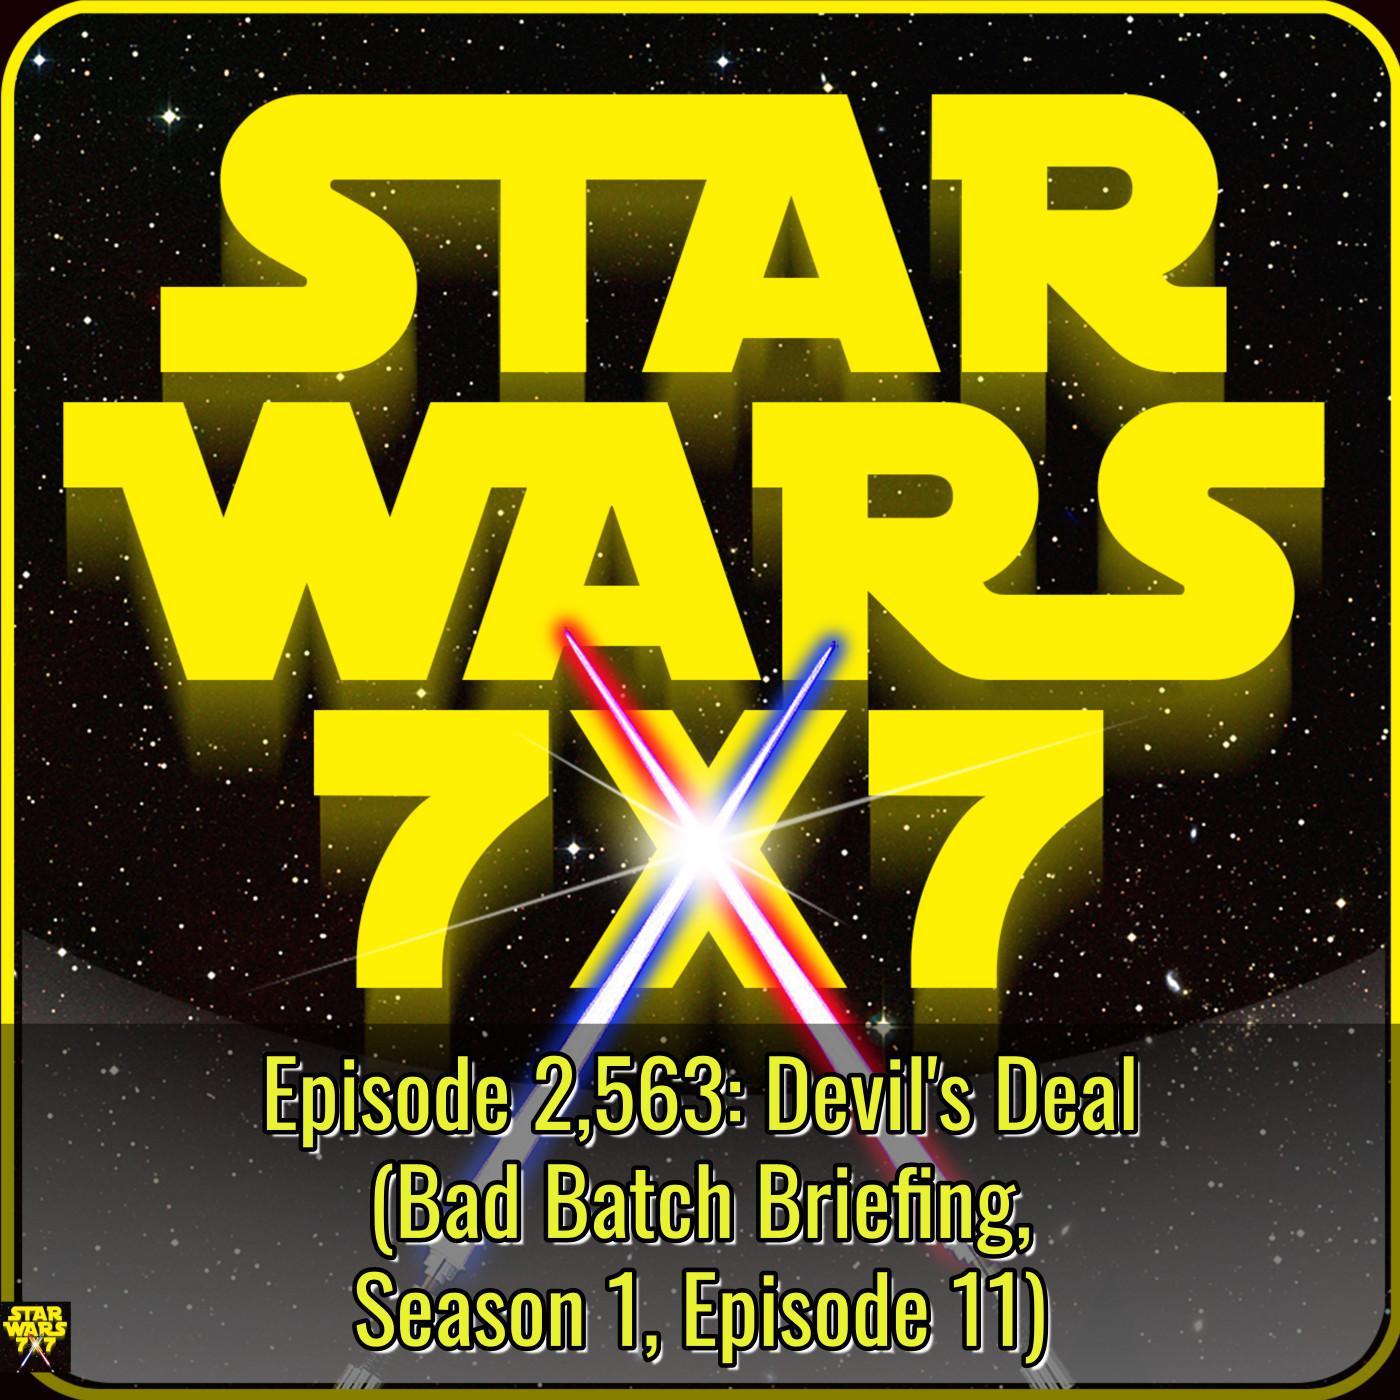 2,563. Devil's Deal (Star Wars: Bad Batch Briefing, Season 1, Episode 11)